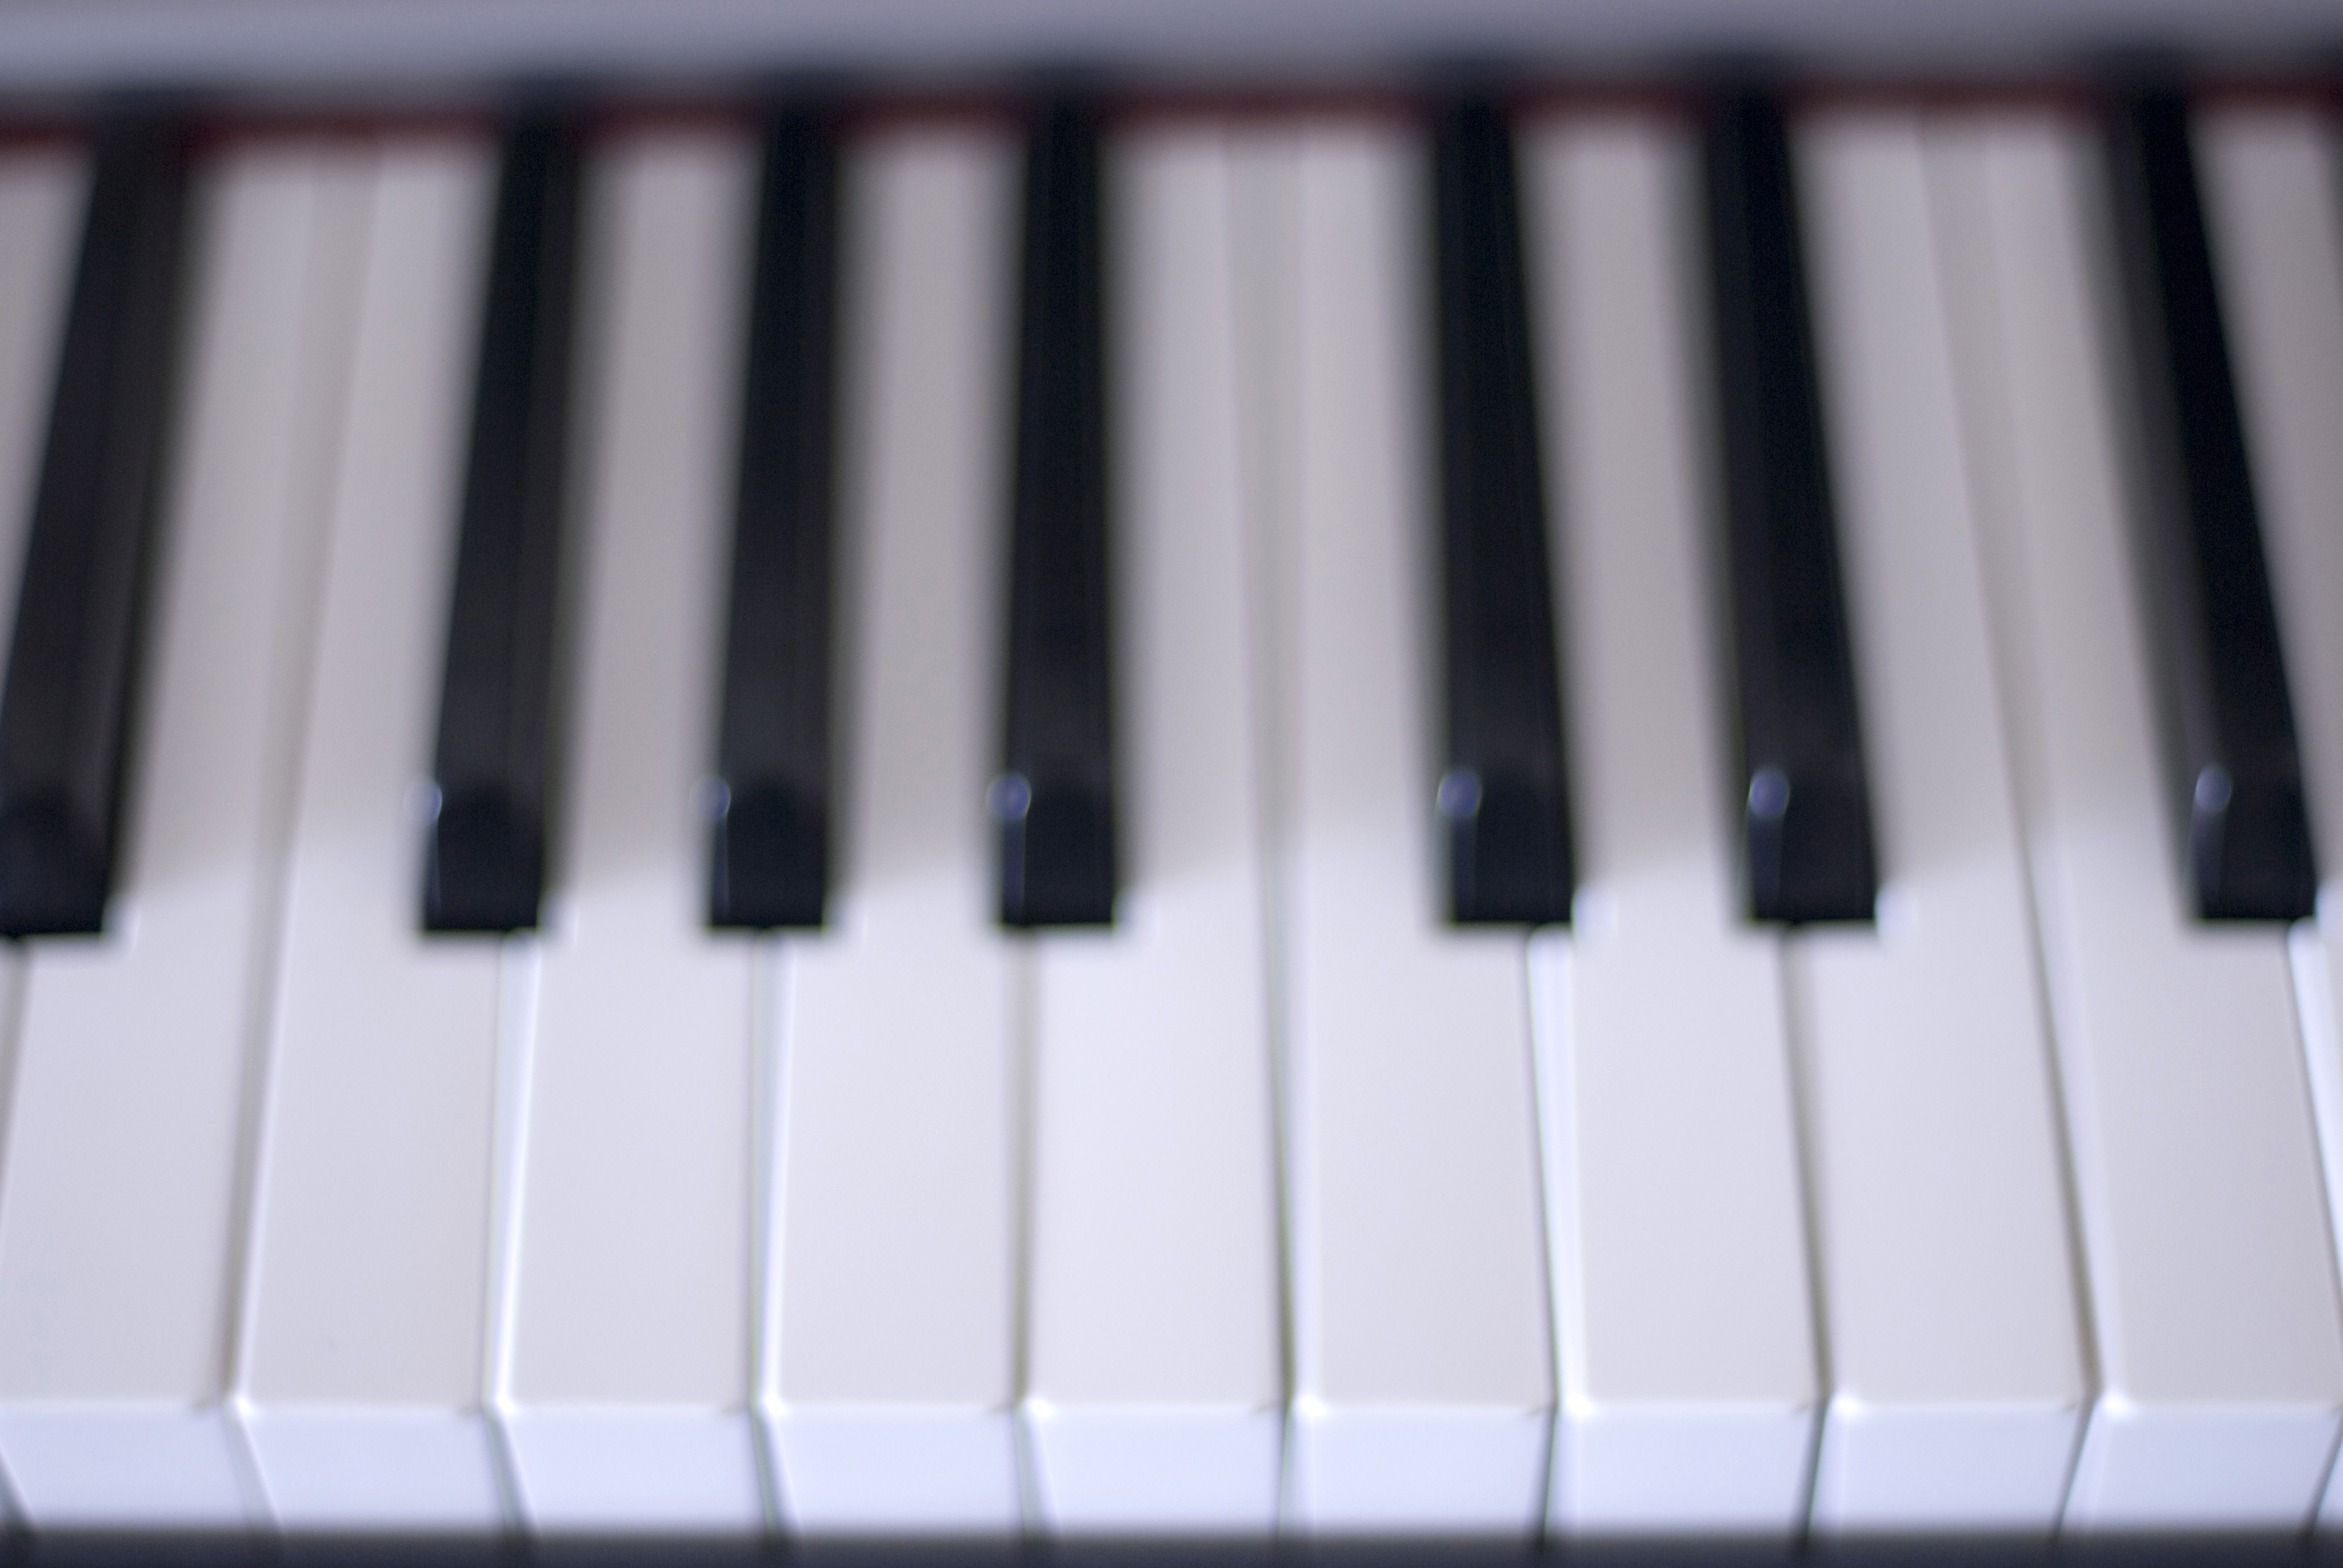 Full Piano Keyboard Keys on a piano keyboard